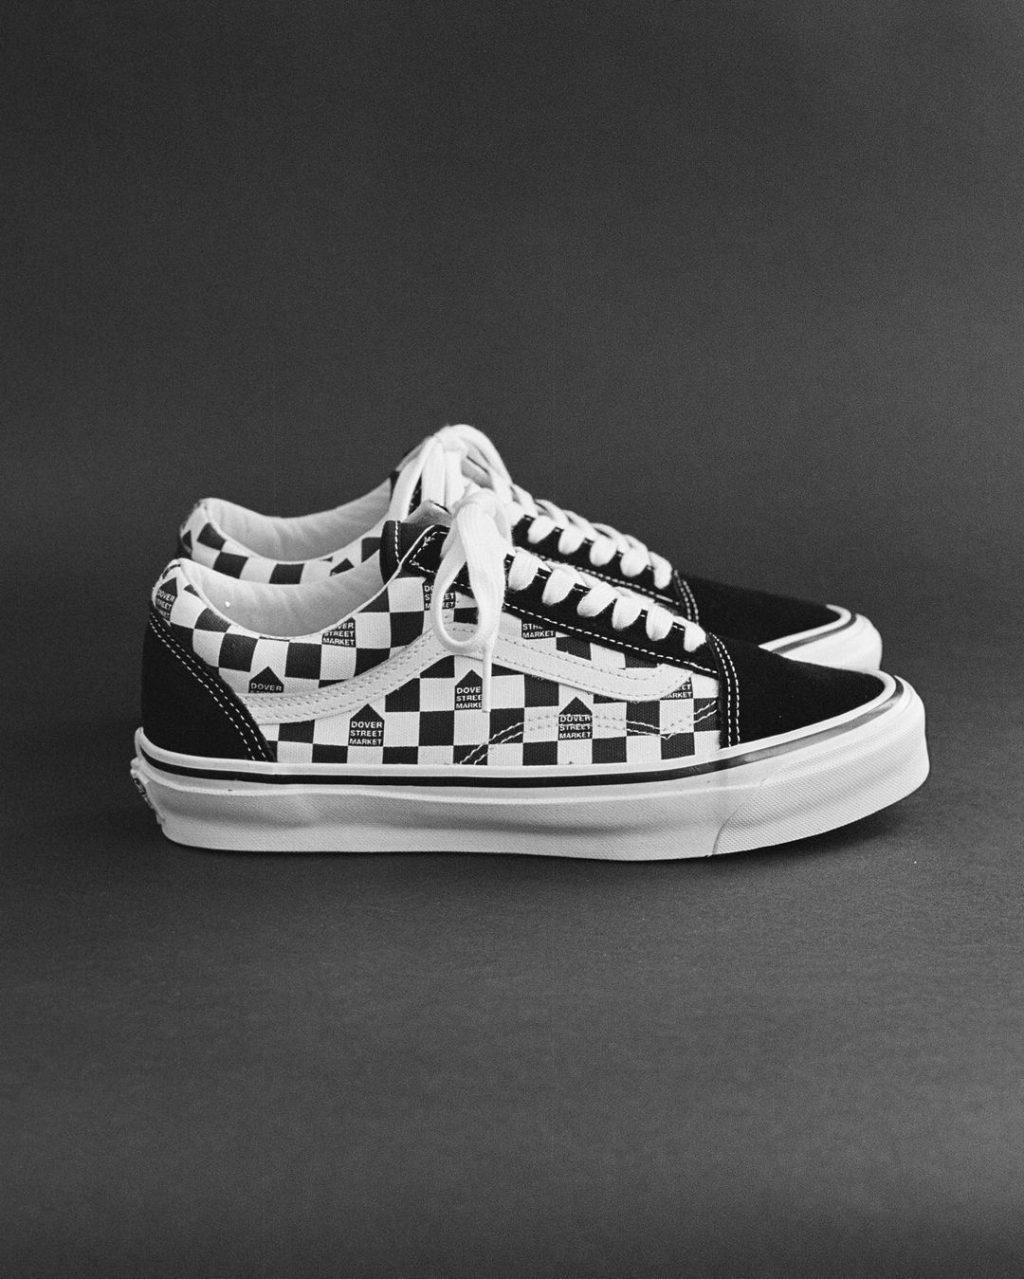 dsm-vans-old-skool-authentic-slip-on-release-20210412